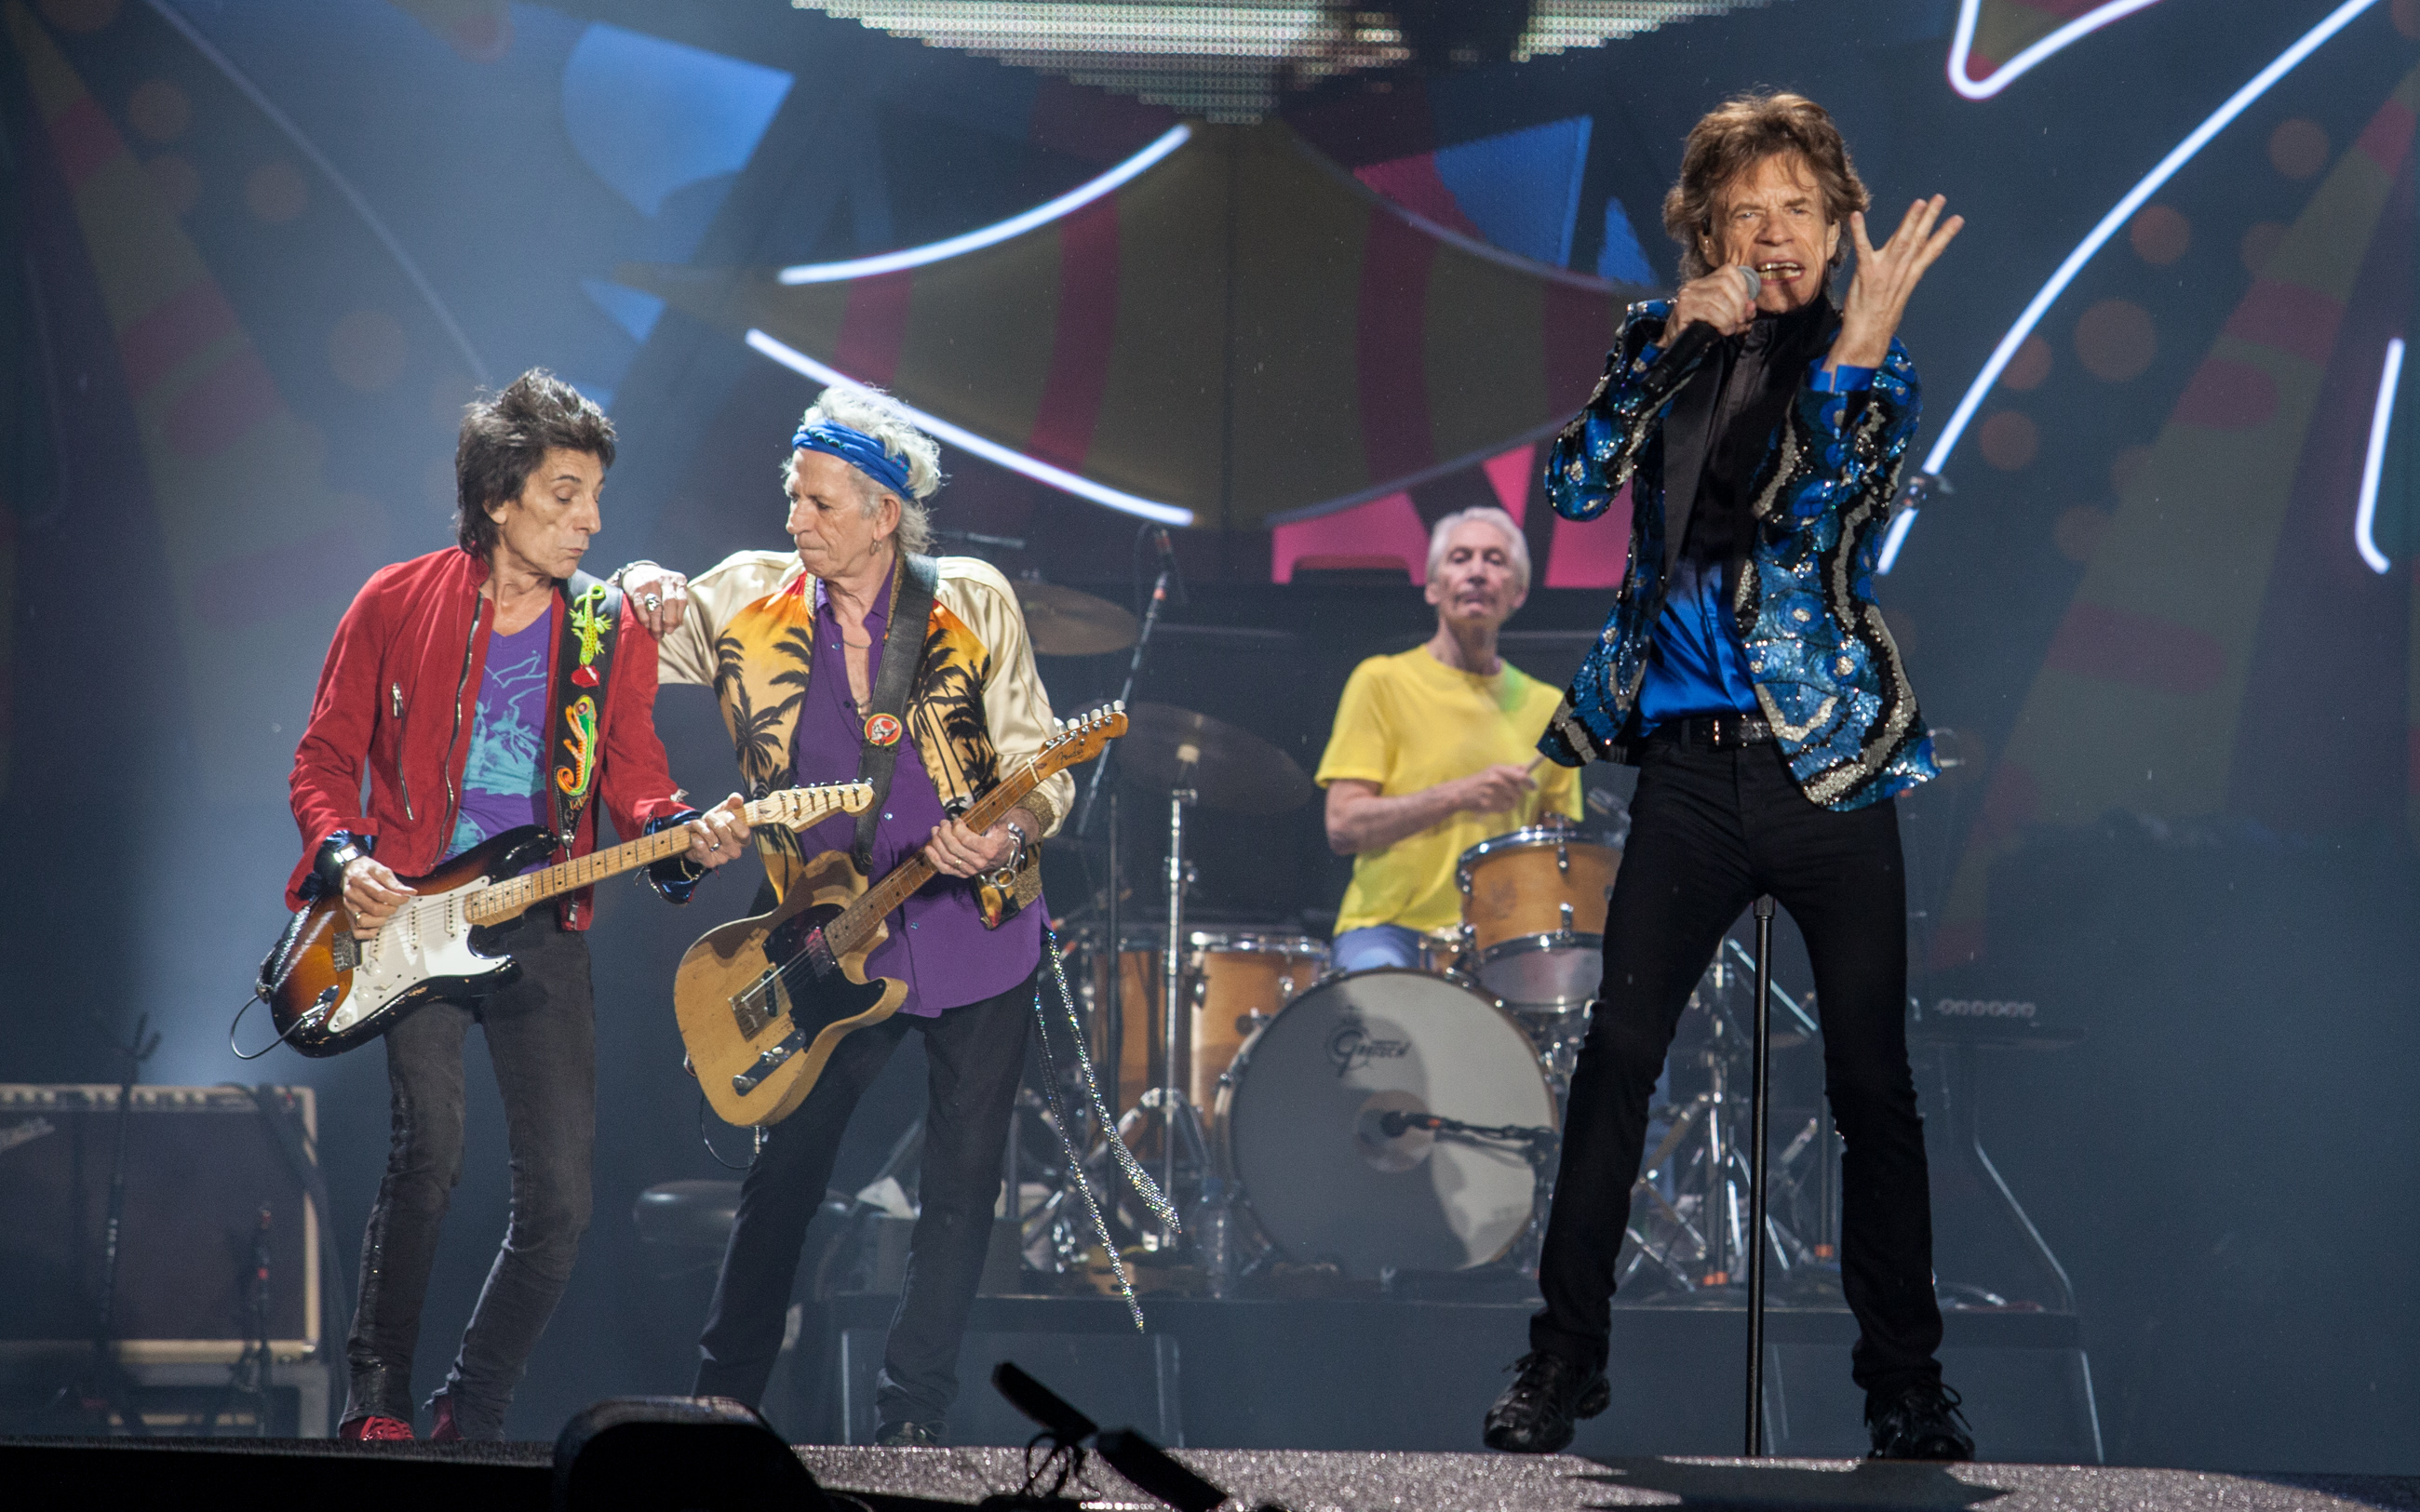 Ronnie Wood, Mick Jagger, Charlie Watts e Keith Richards durante show dos Rolling Stones em São Paulo